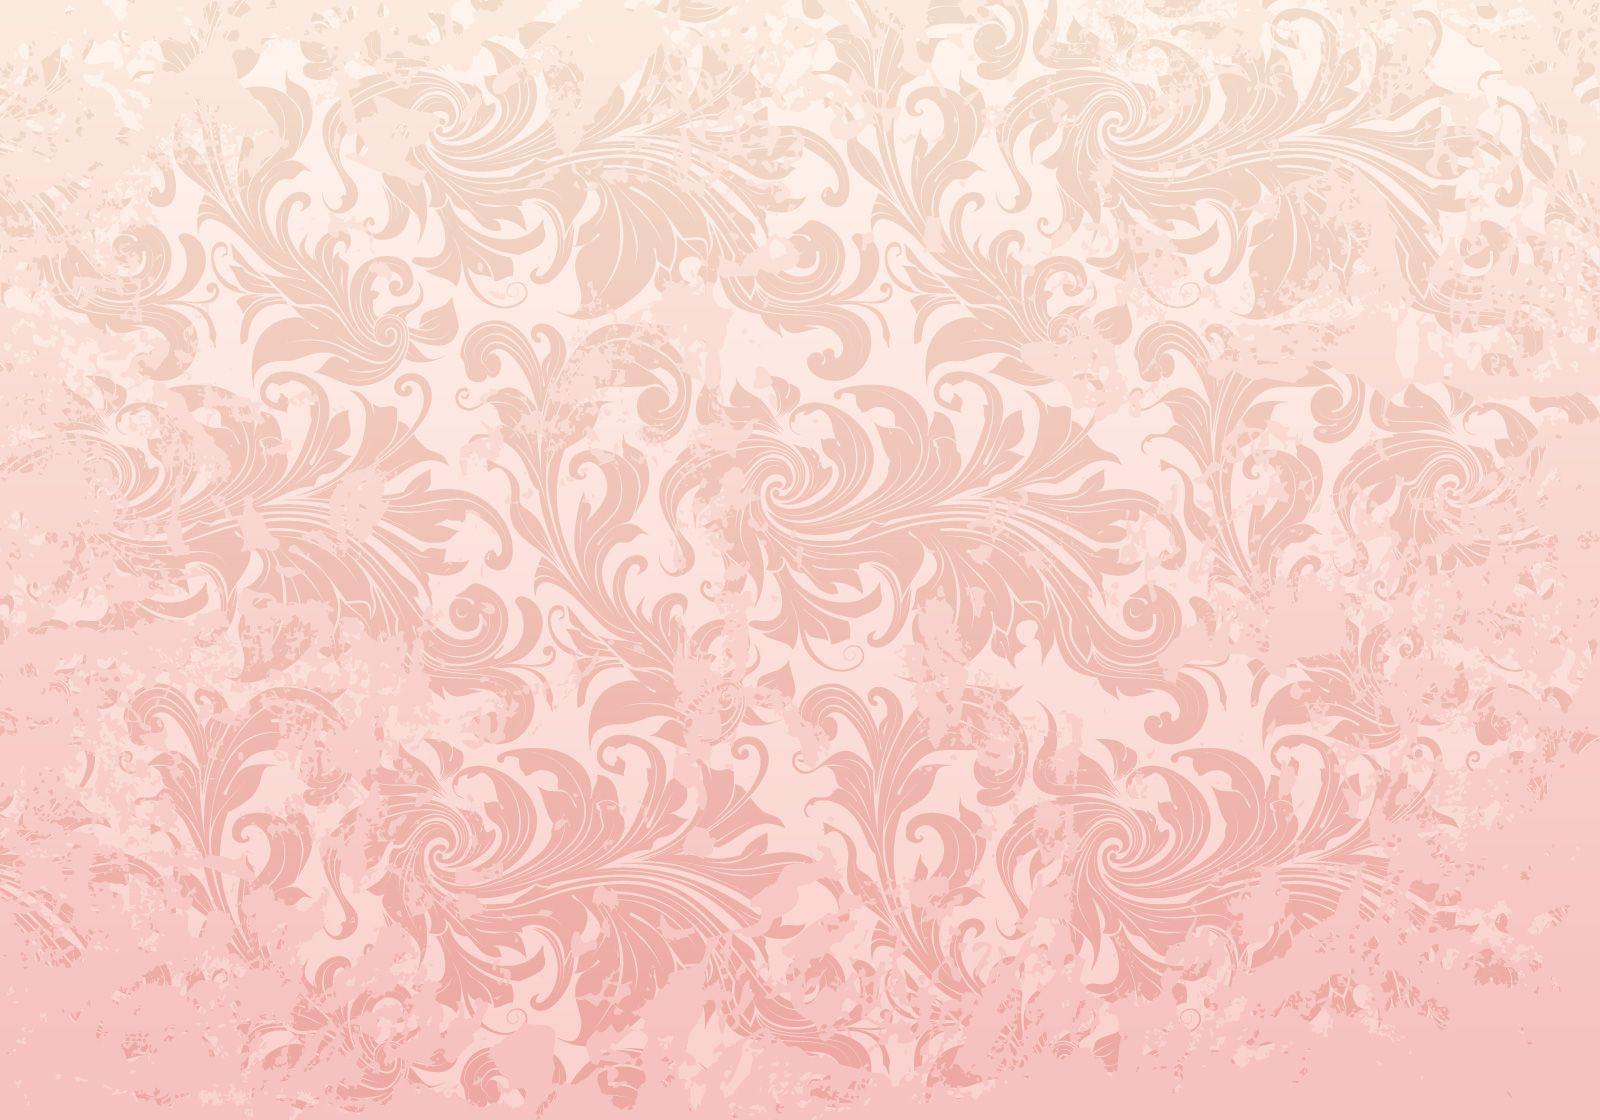 Pink Grunge Vintage Pattern 1600 Jpg 1600 1120 Wallpapers Vintage Pink Pattern Background Pink Wallpaper Vintage